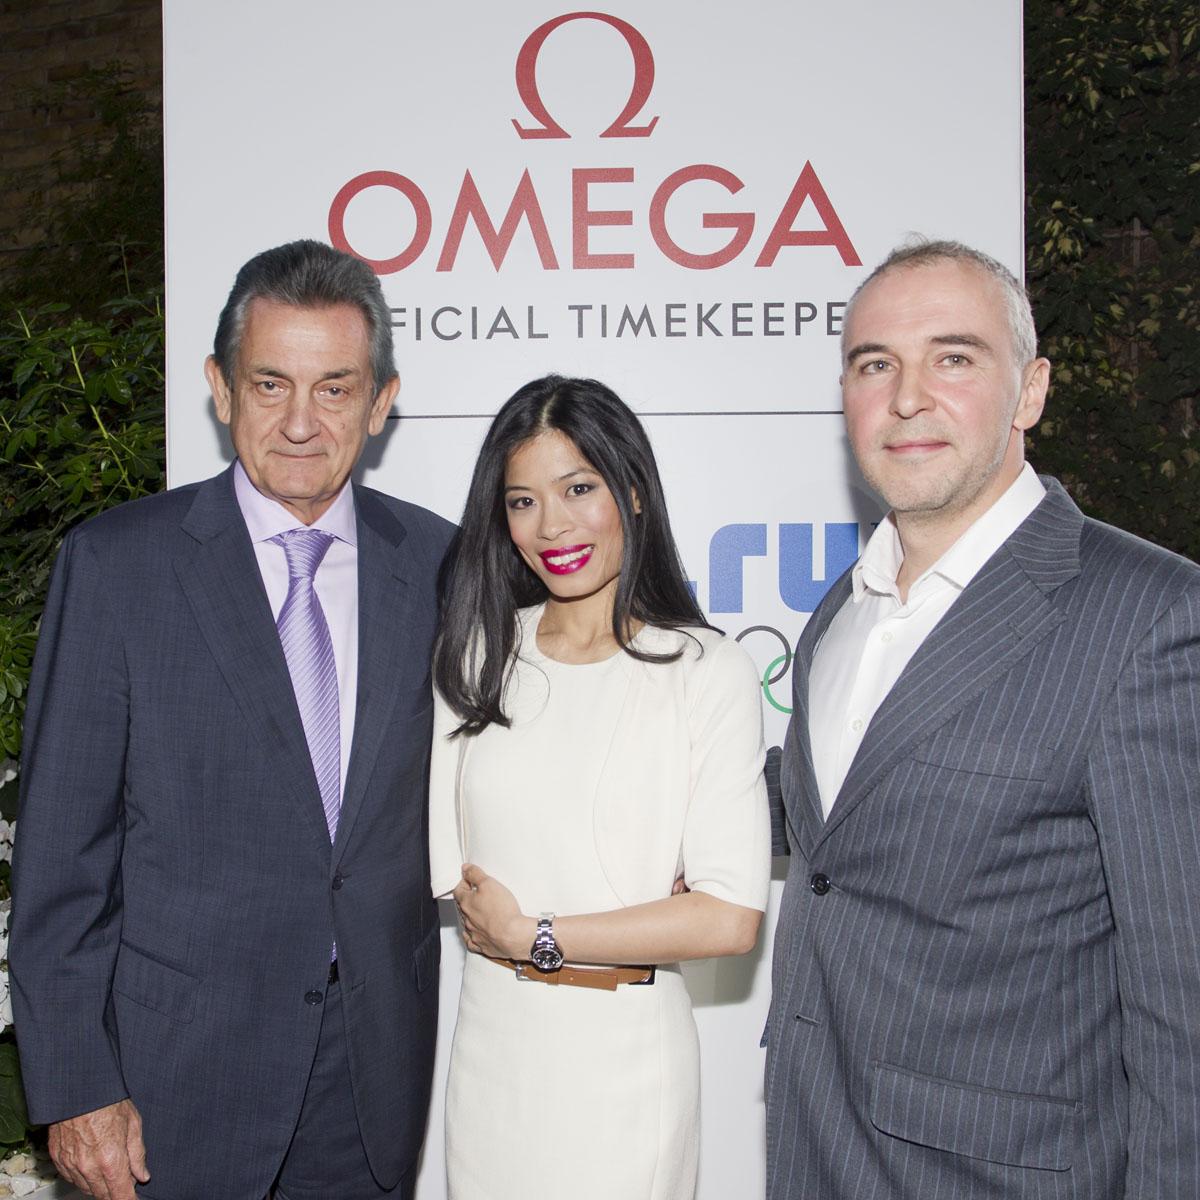 La Cote des Montres : Photo - Omega présente sa nouvelle ambassadrice Vanessa-Mae